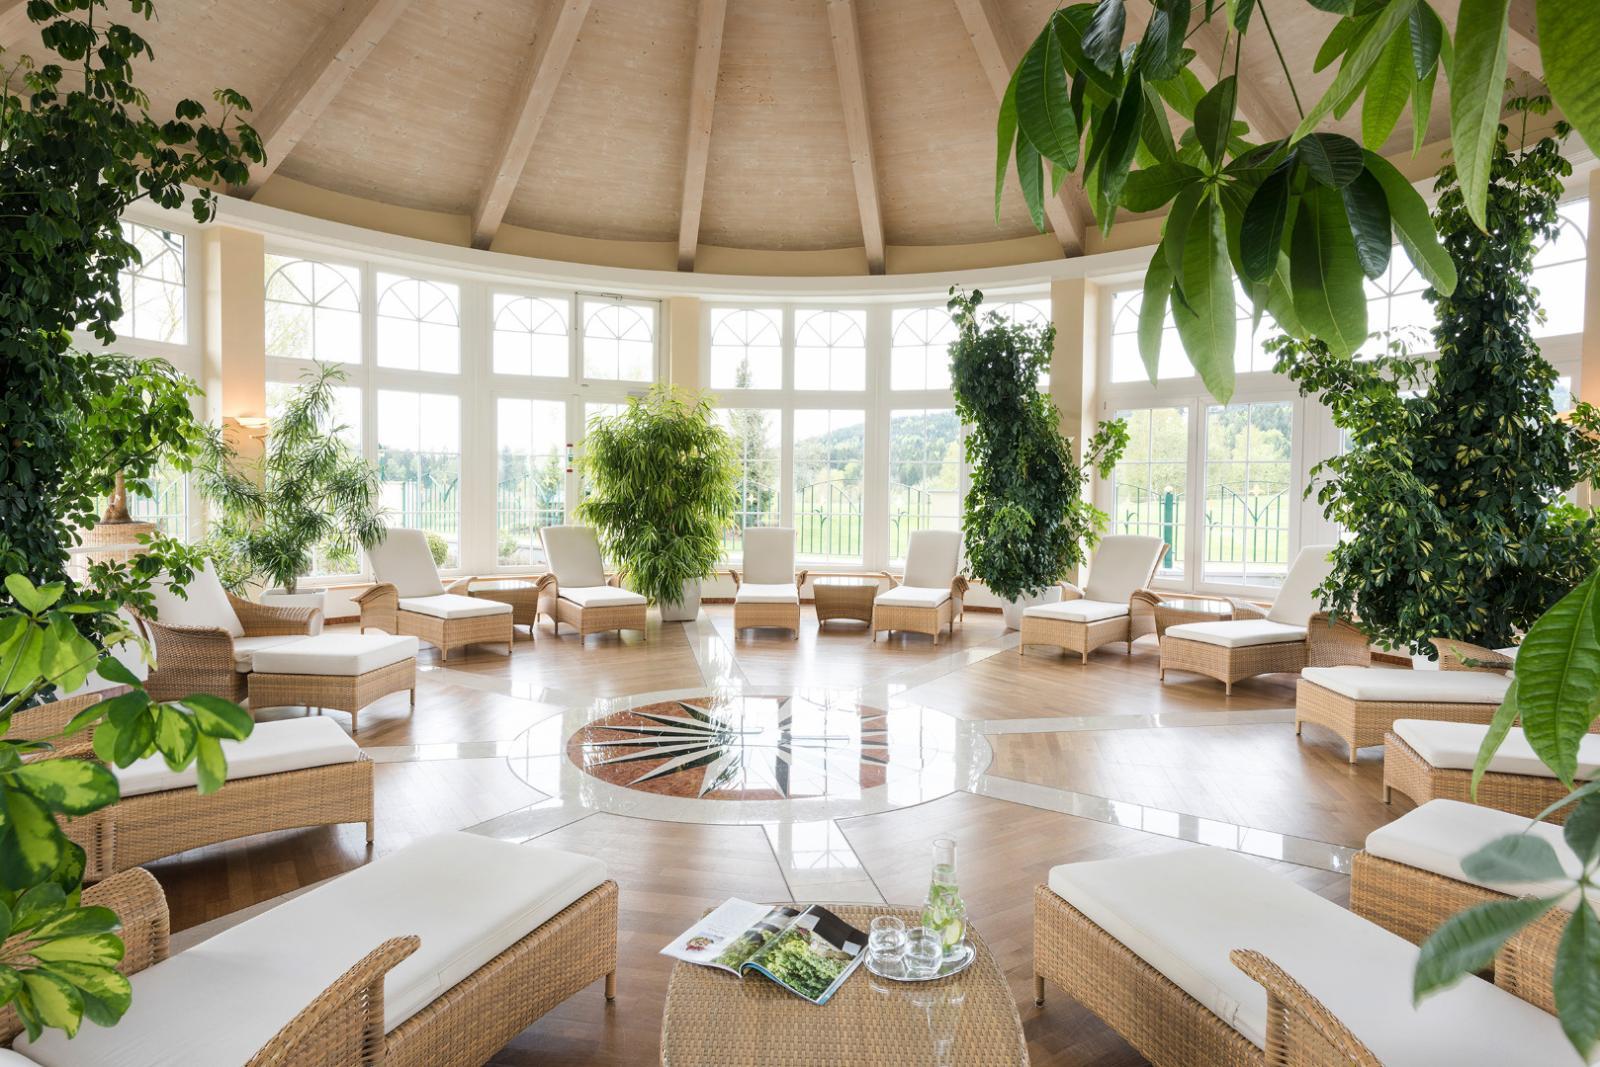 Dampfbad: Foto vom Wellnesshotel Wellness & Spa Resort Mooshof | Wellness Bayern